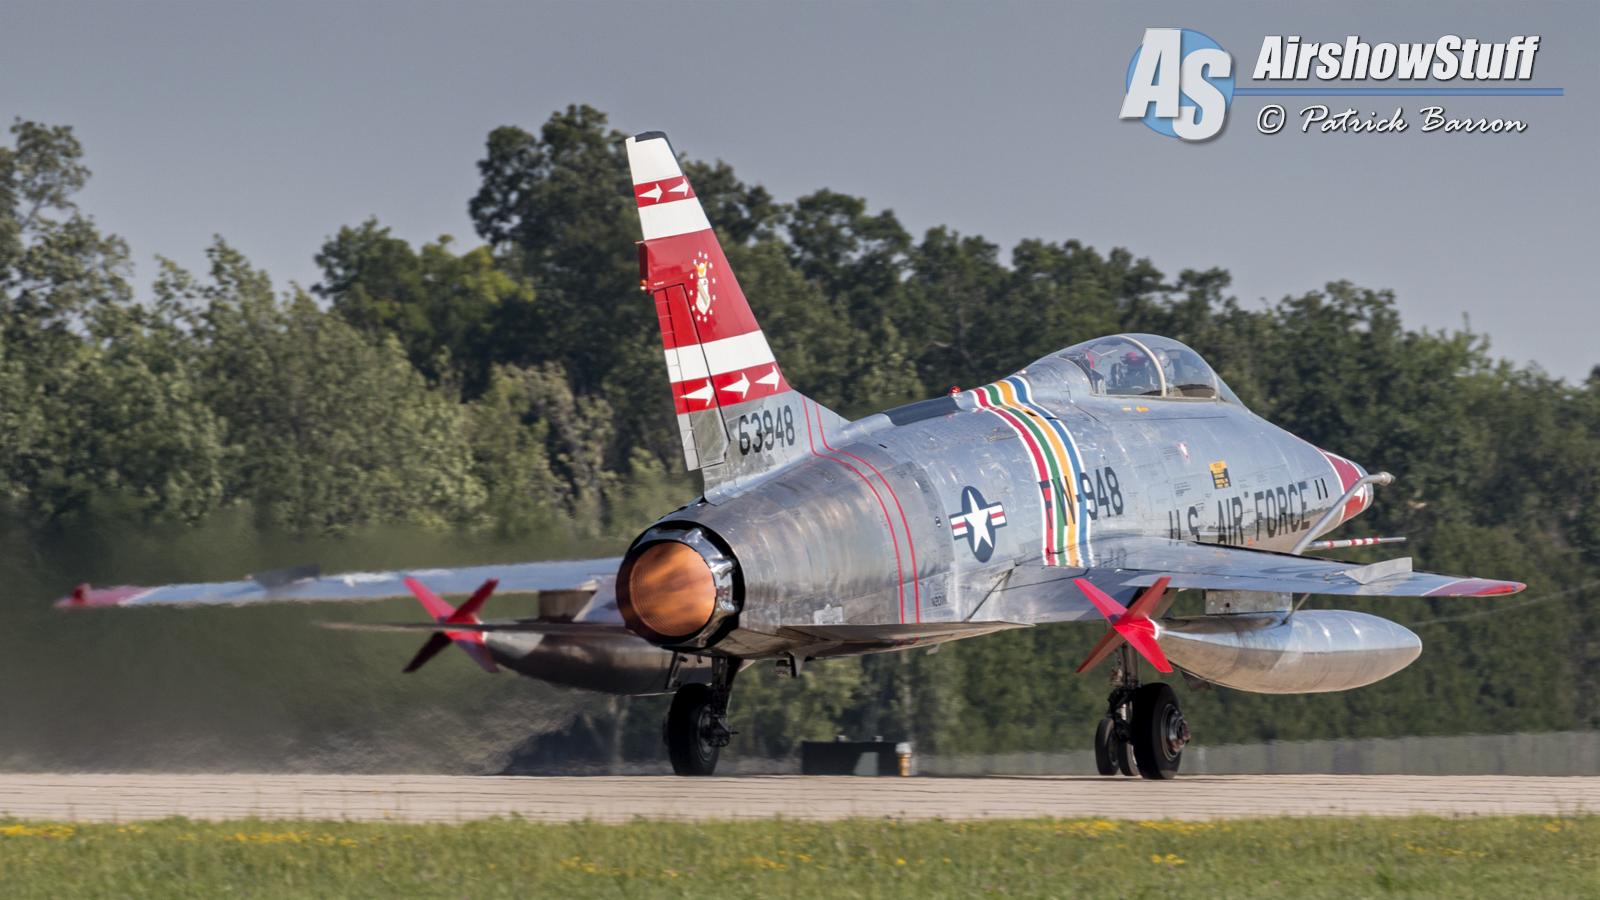 EAA Airventure Oshkosh 2015 - F-100 Super Sabre - Patrick Barron